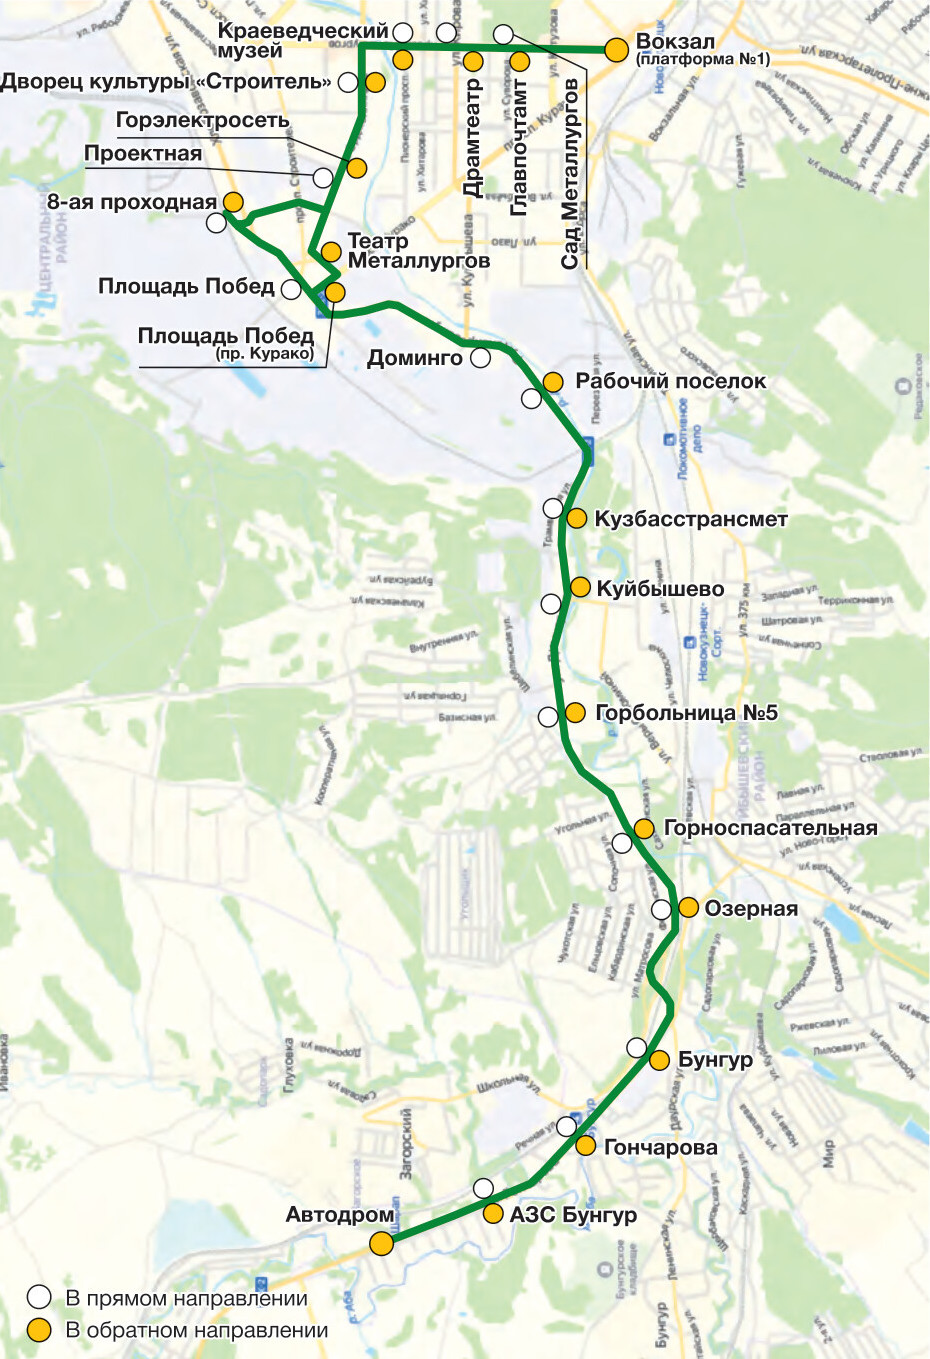 Автобус №53 ВОКЗАЛ - БУНГУР | Карта маршрута